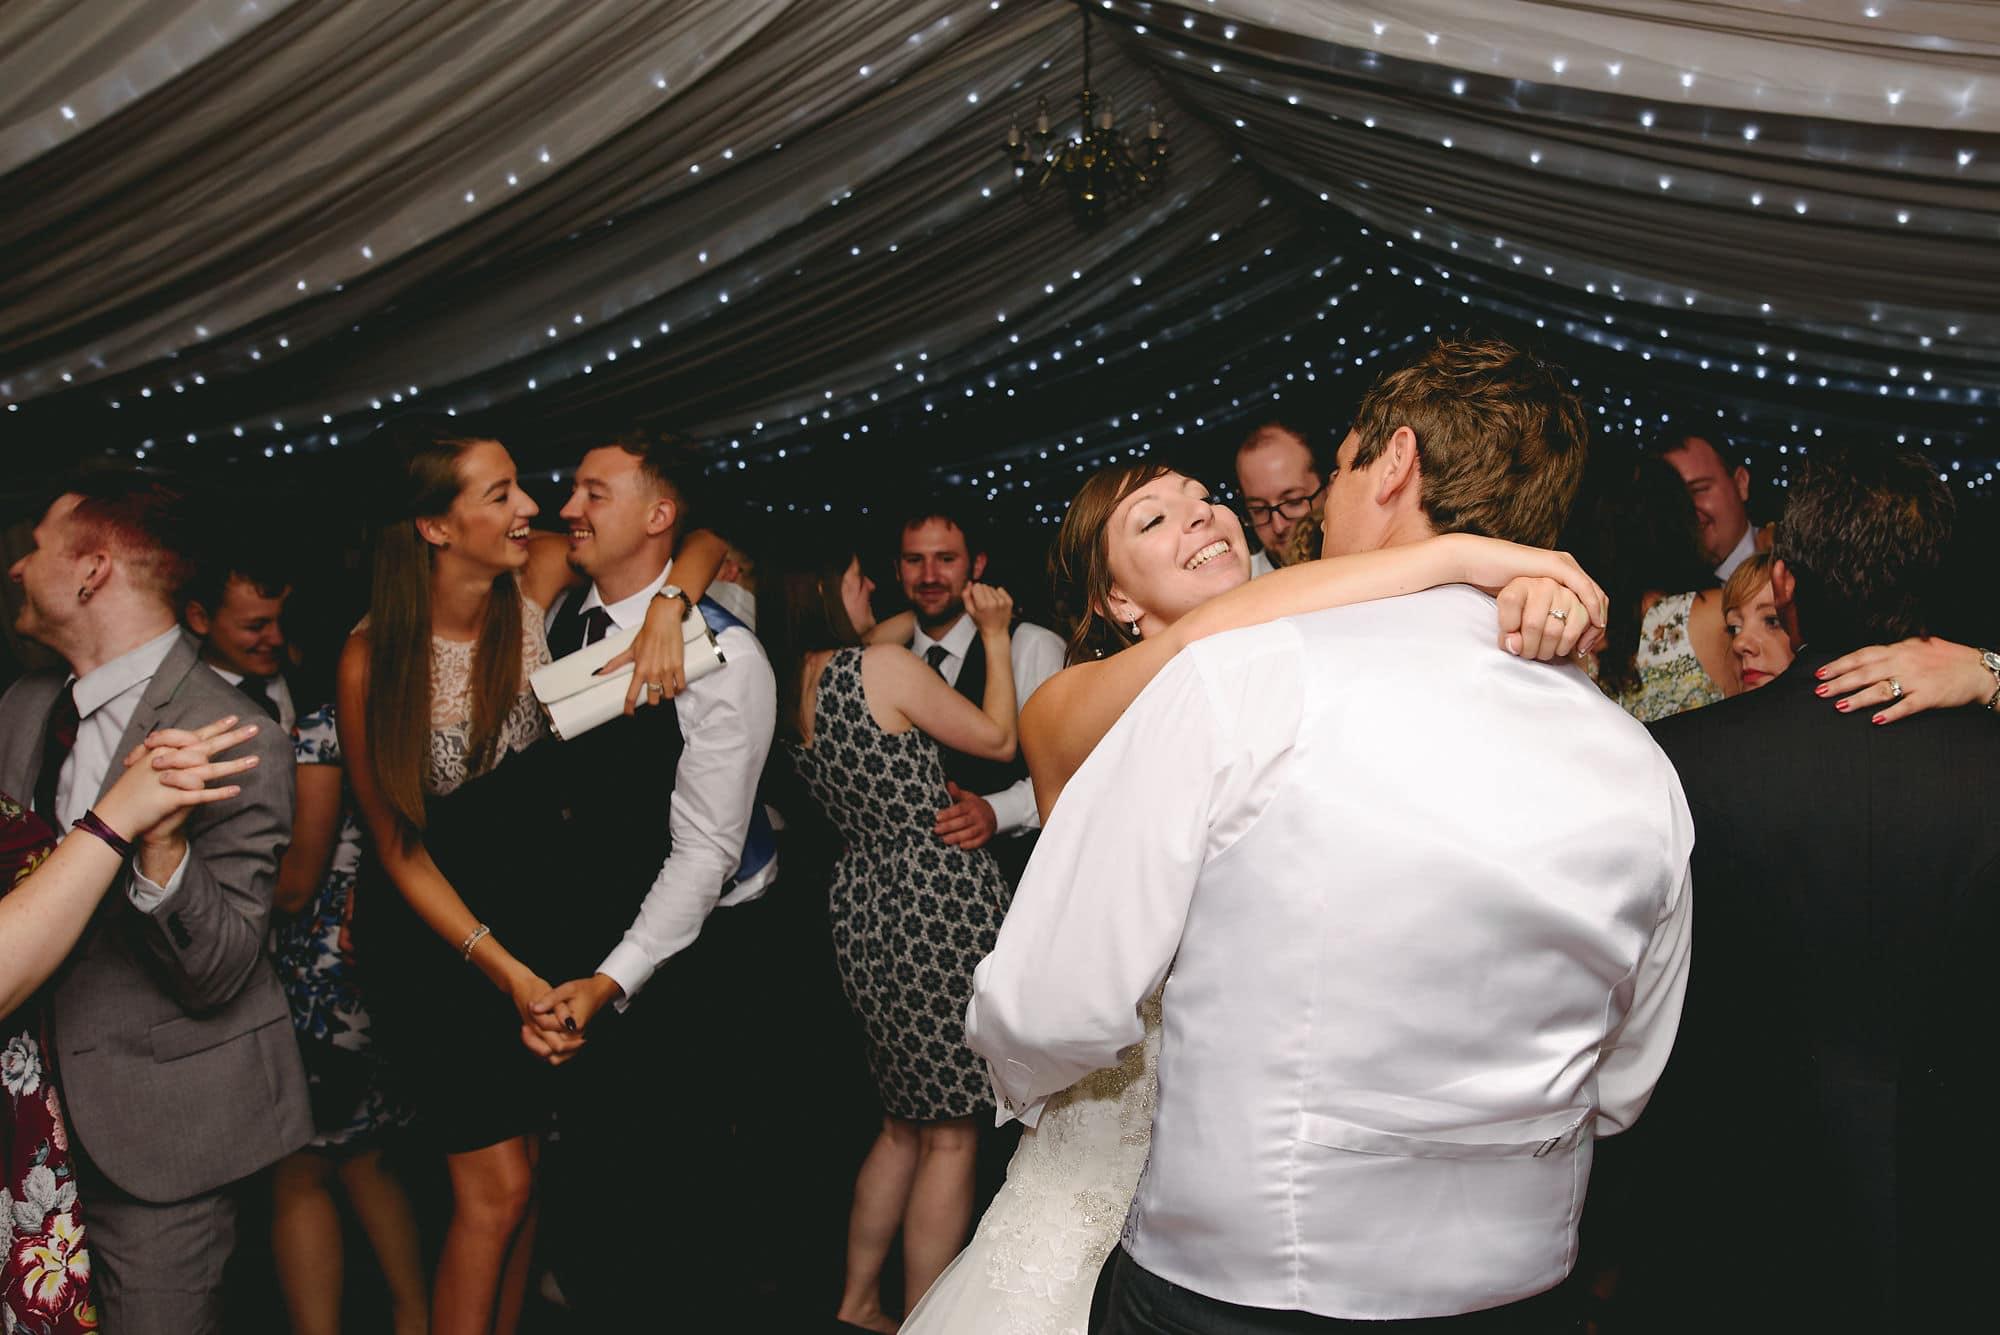 Matt & Holly's Beccles Wedding 5